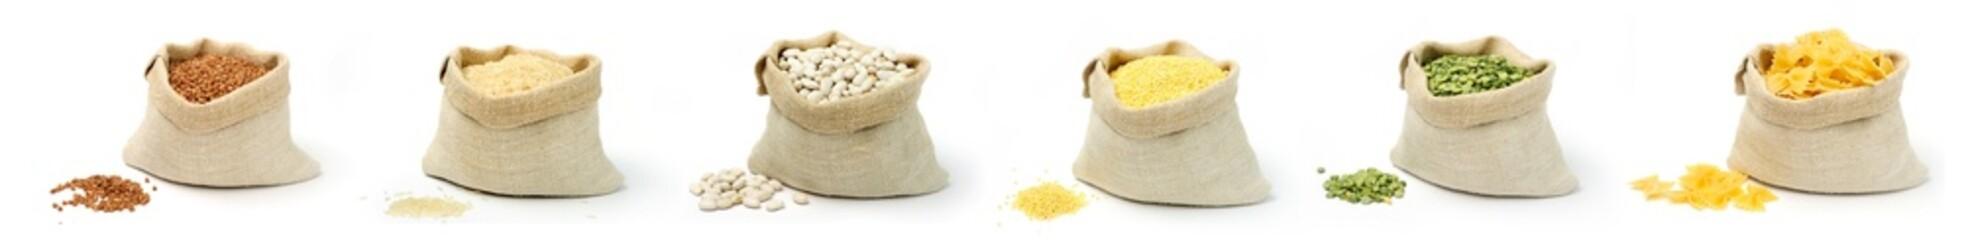 cereals in bags